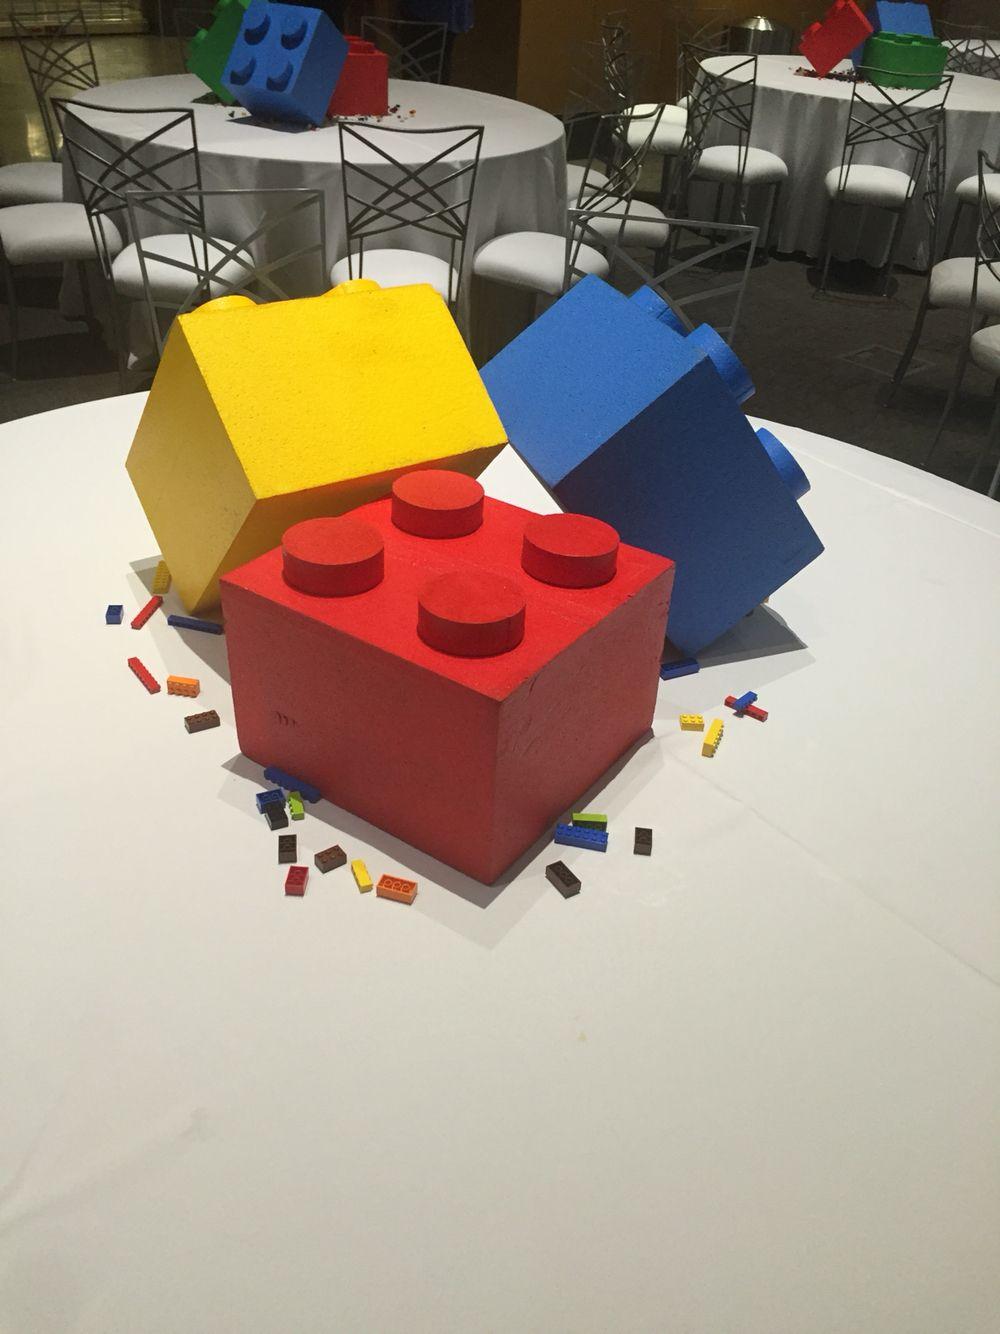 lego event centerpieces event planning ideas pinterest. Black Bedroom Furniture Sets. Home Design Ideas